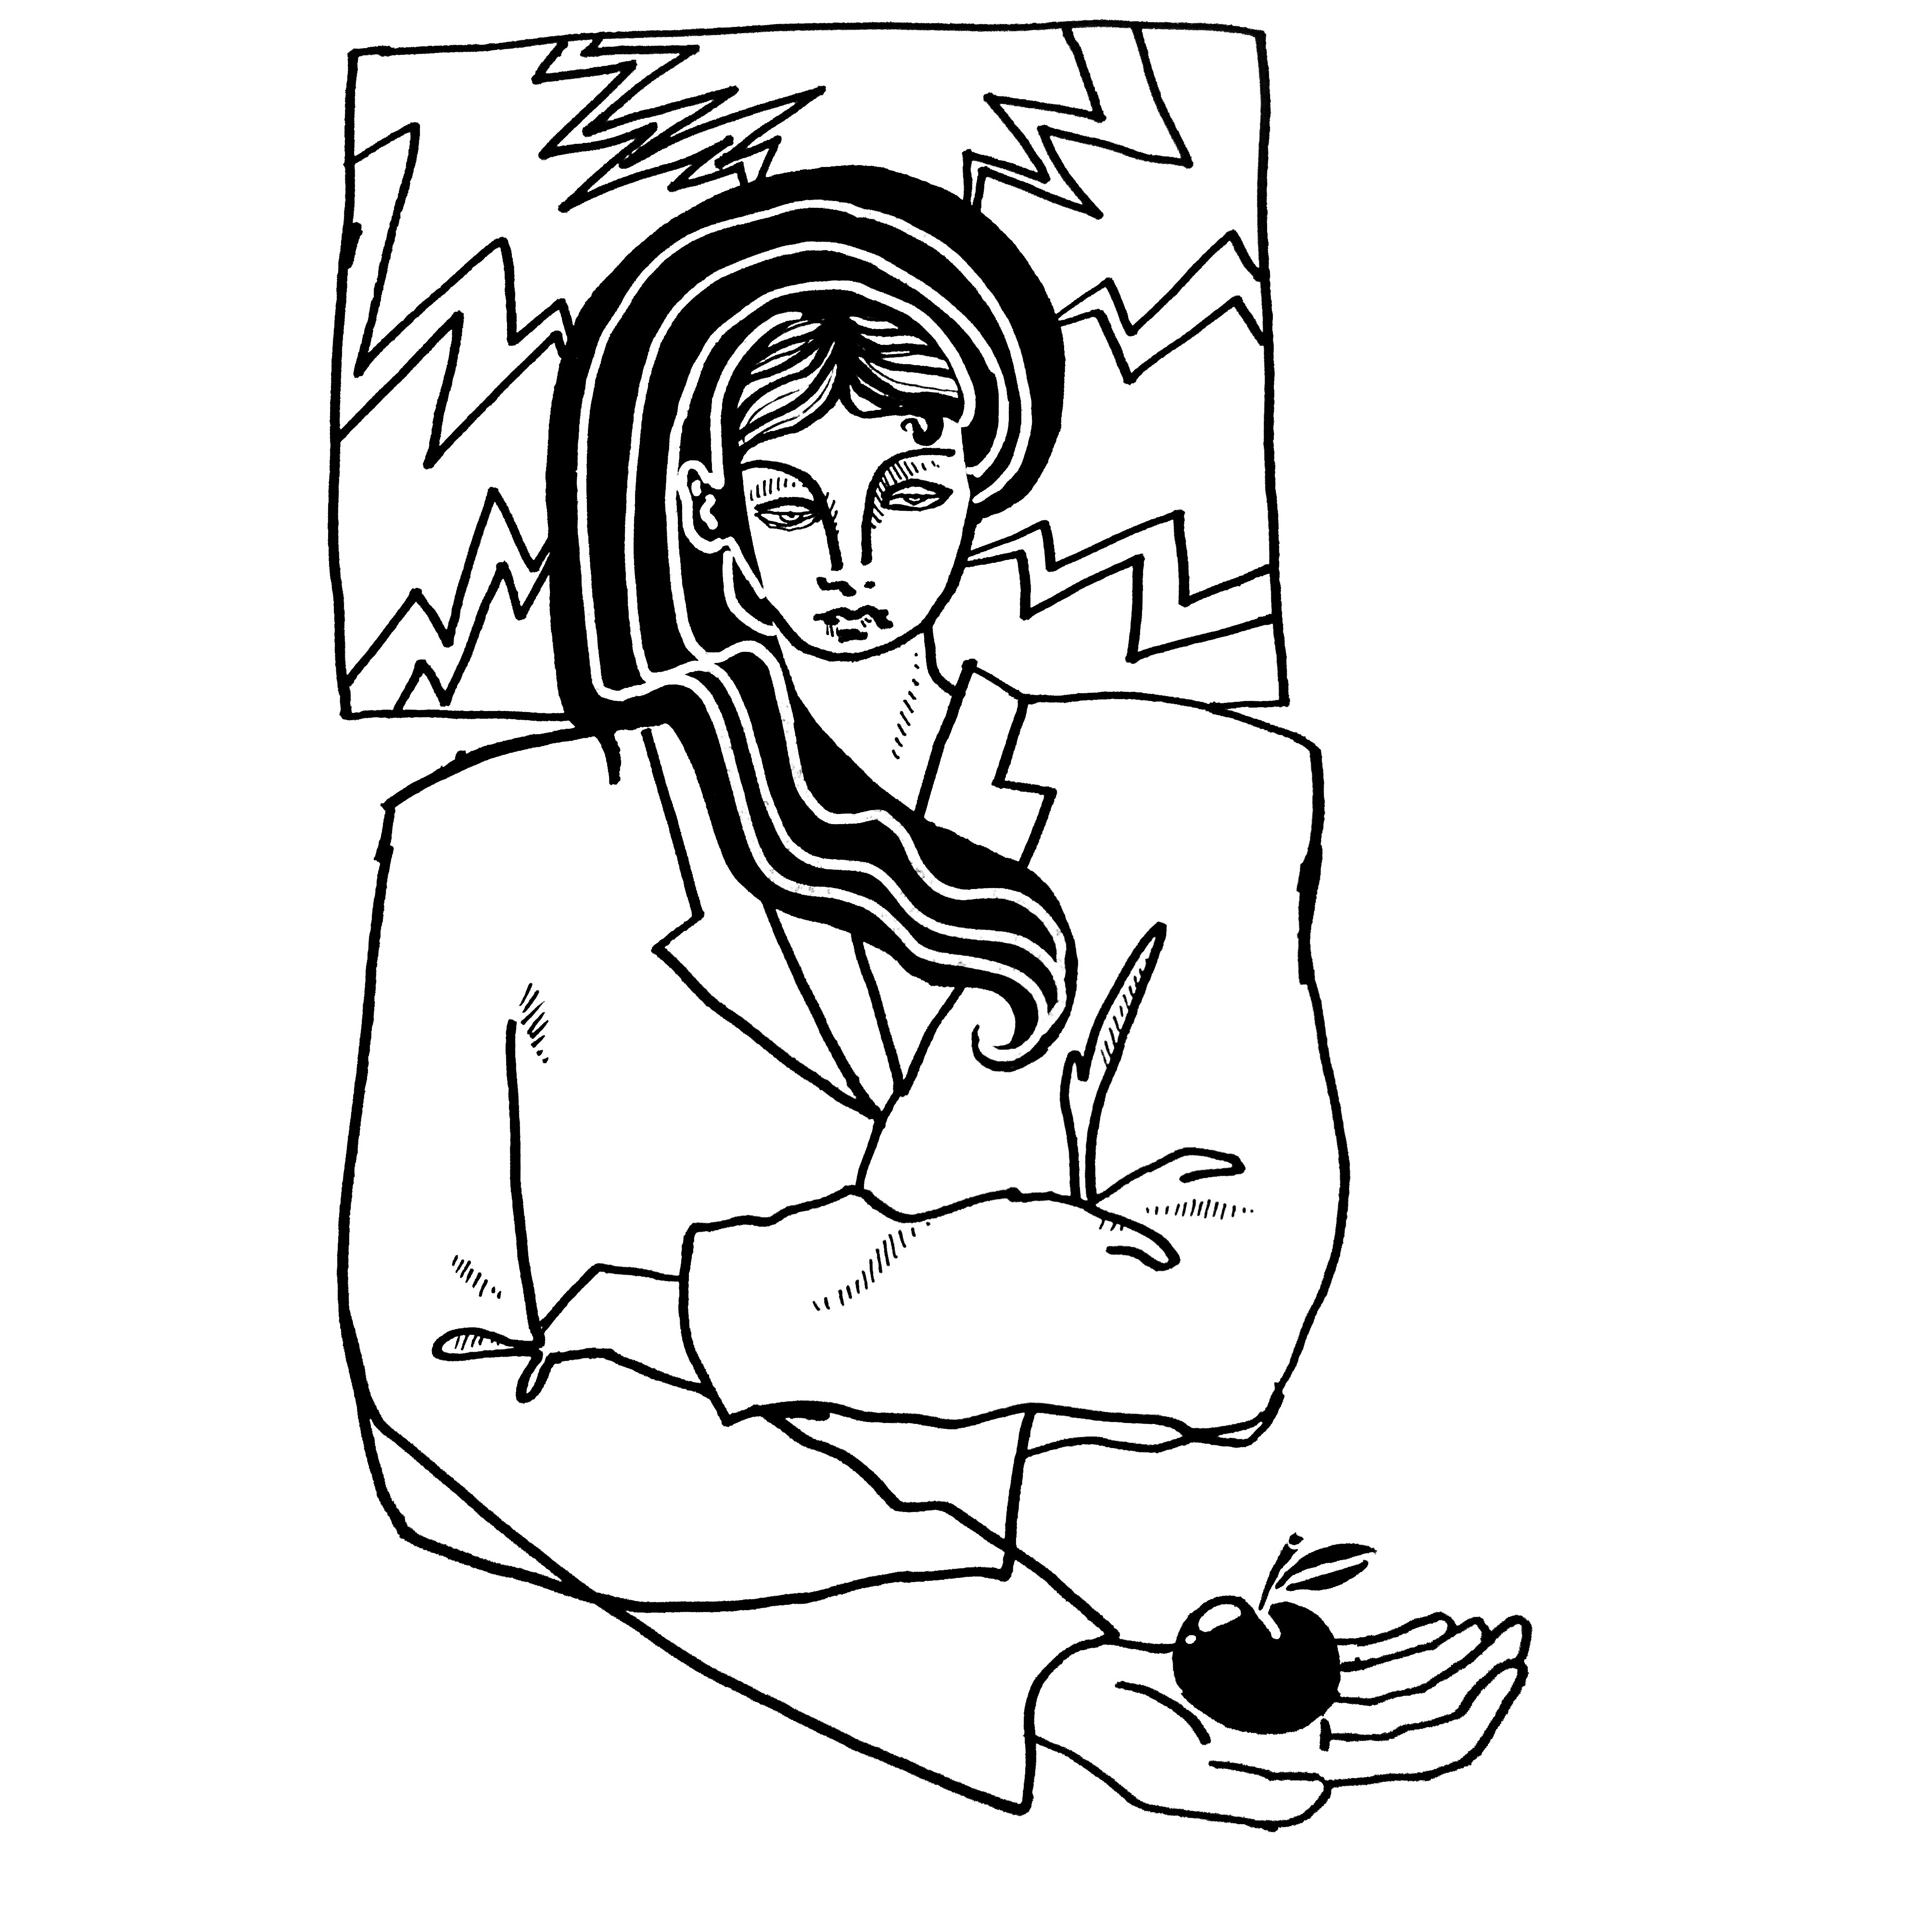 Whitagram-Image 6